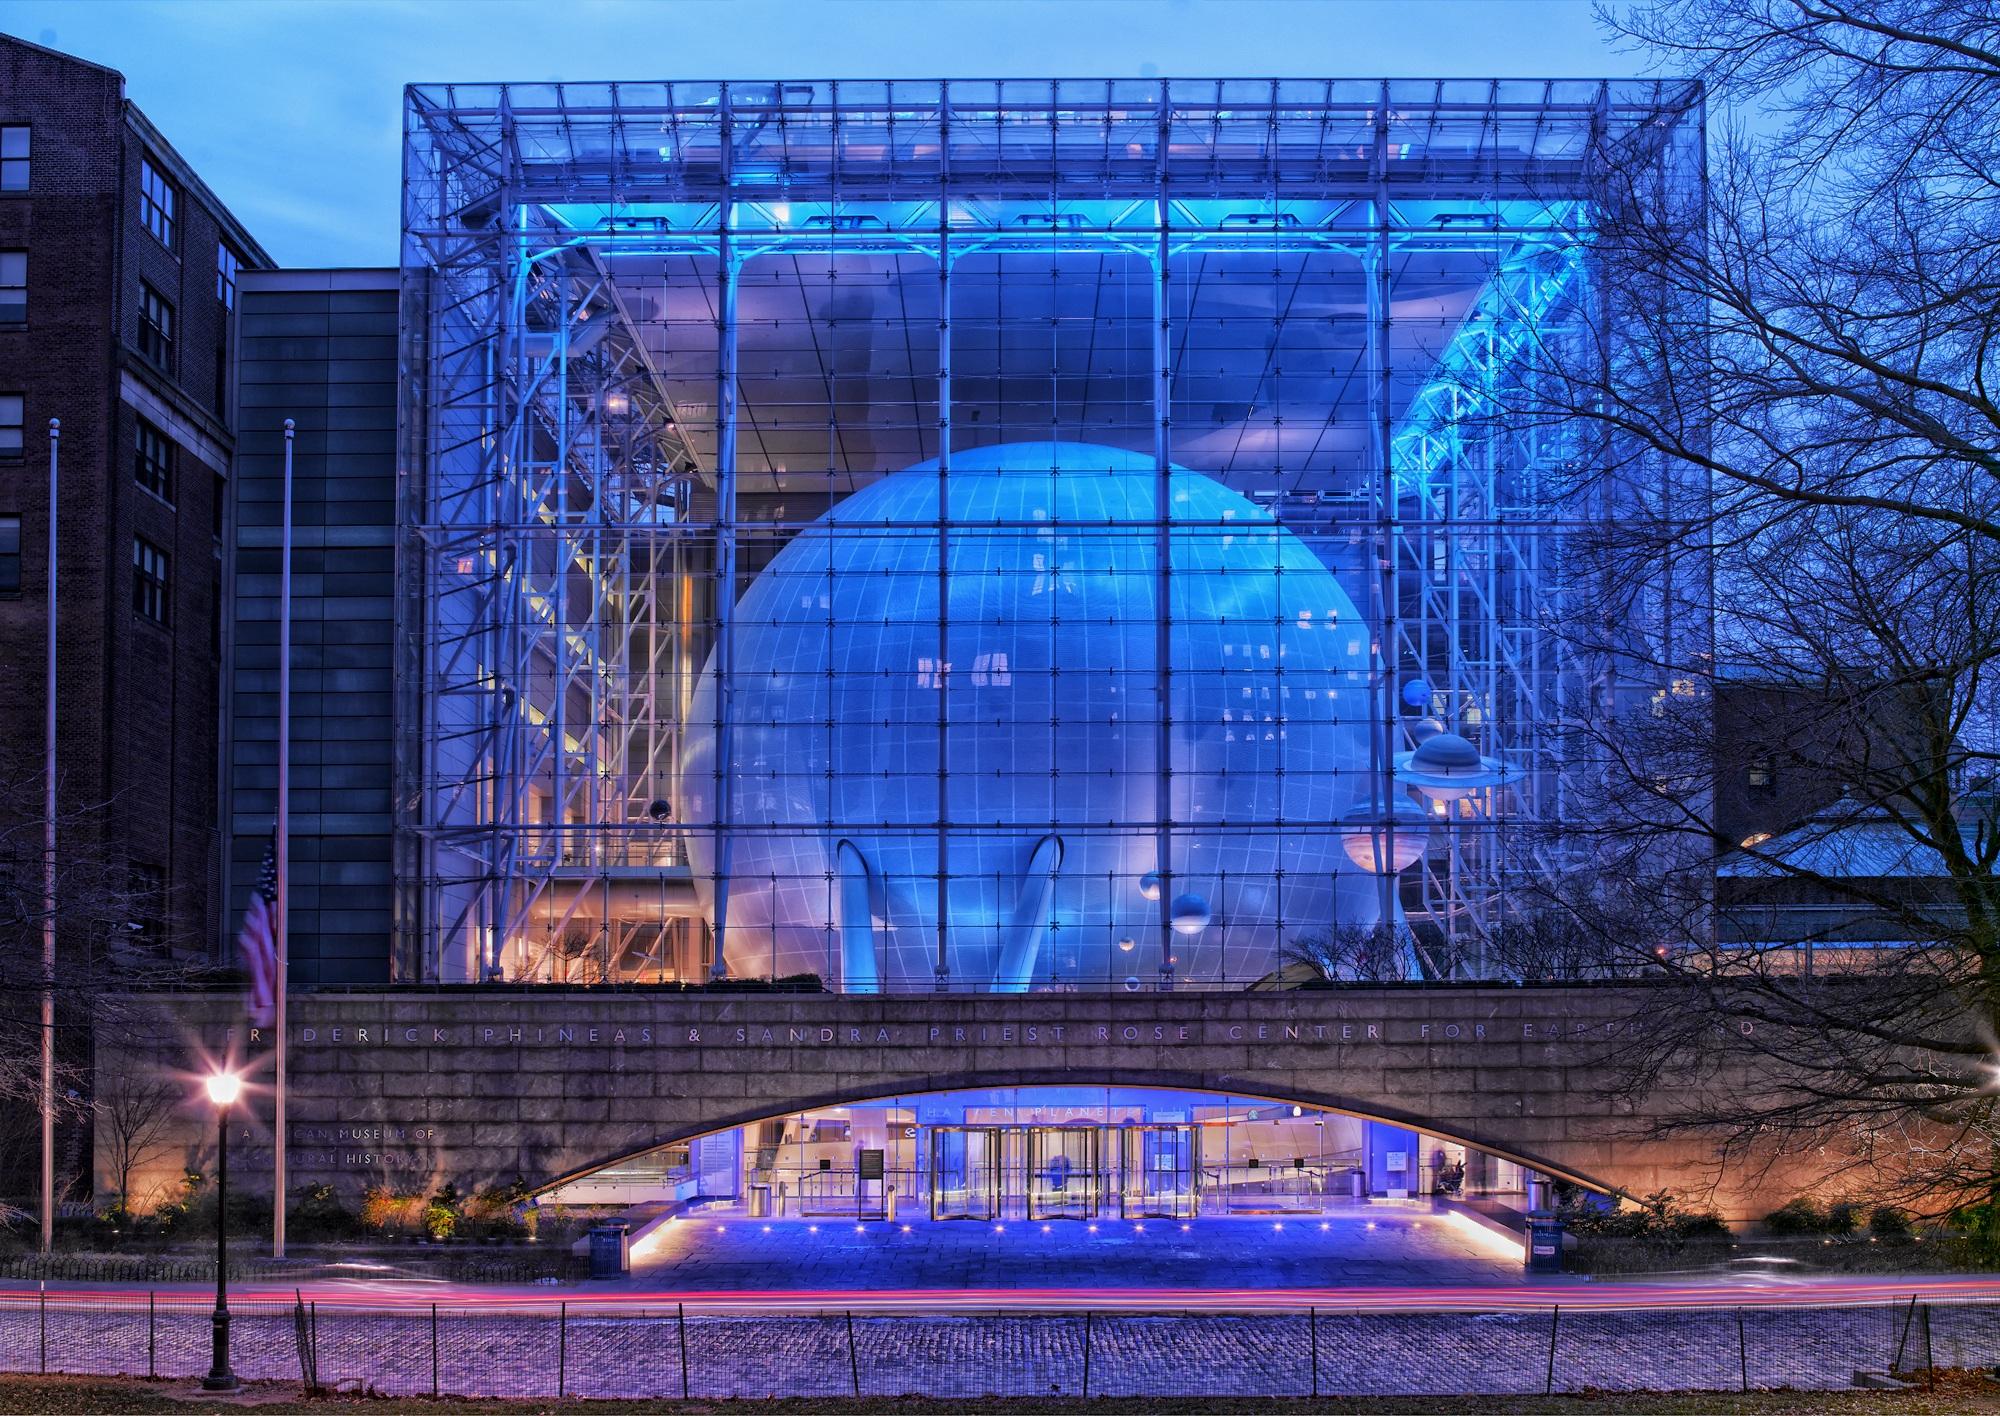 free images night glass building urban manhattan new york